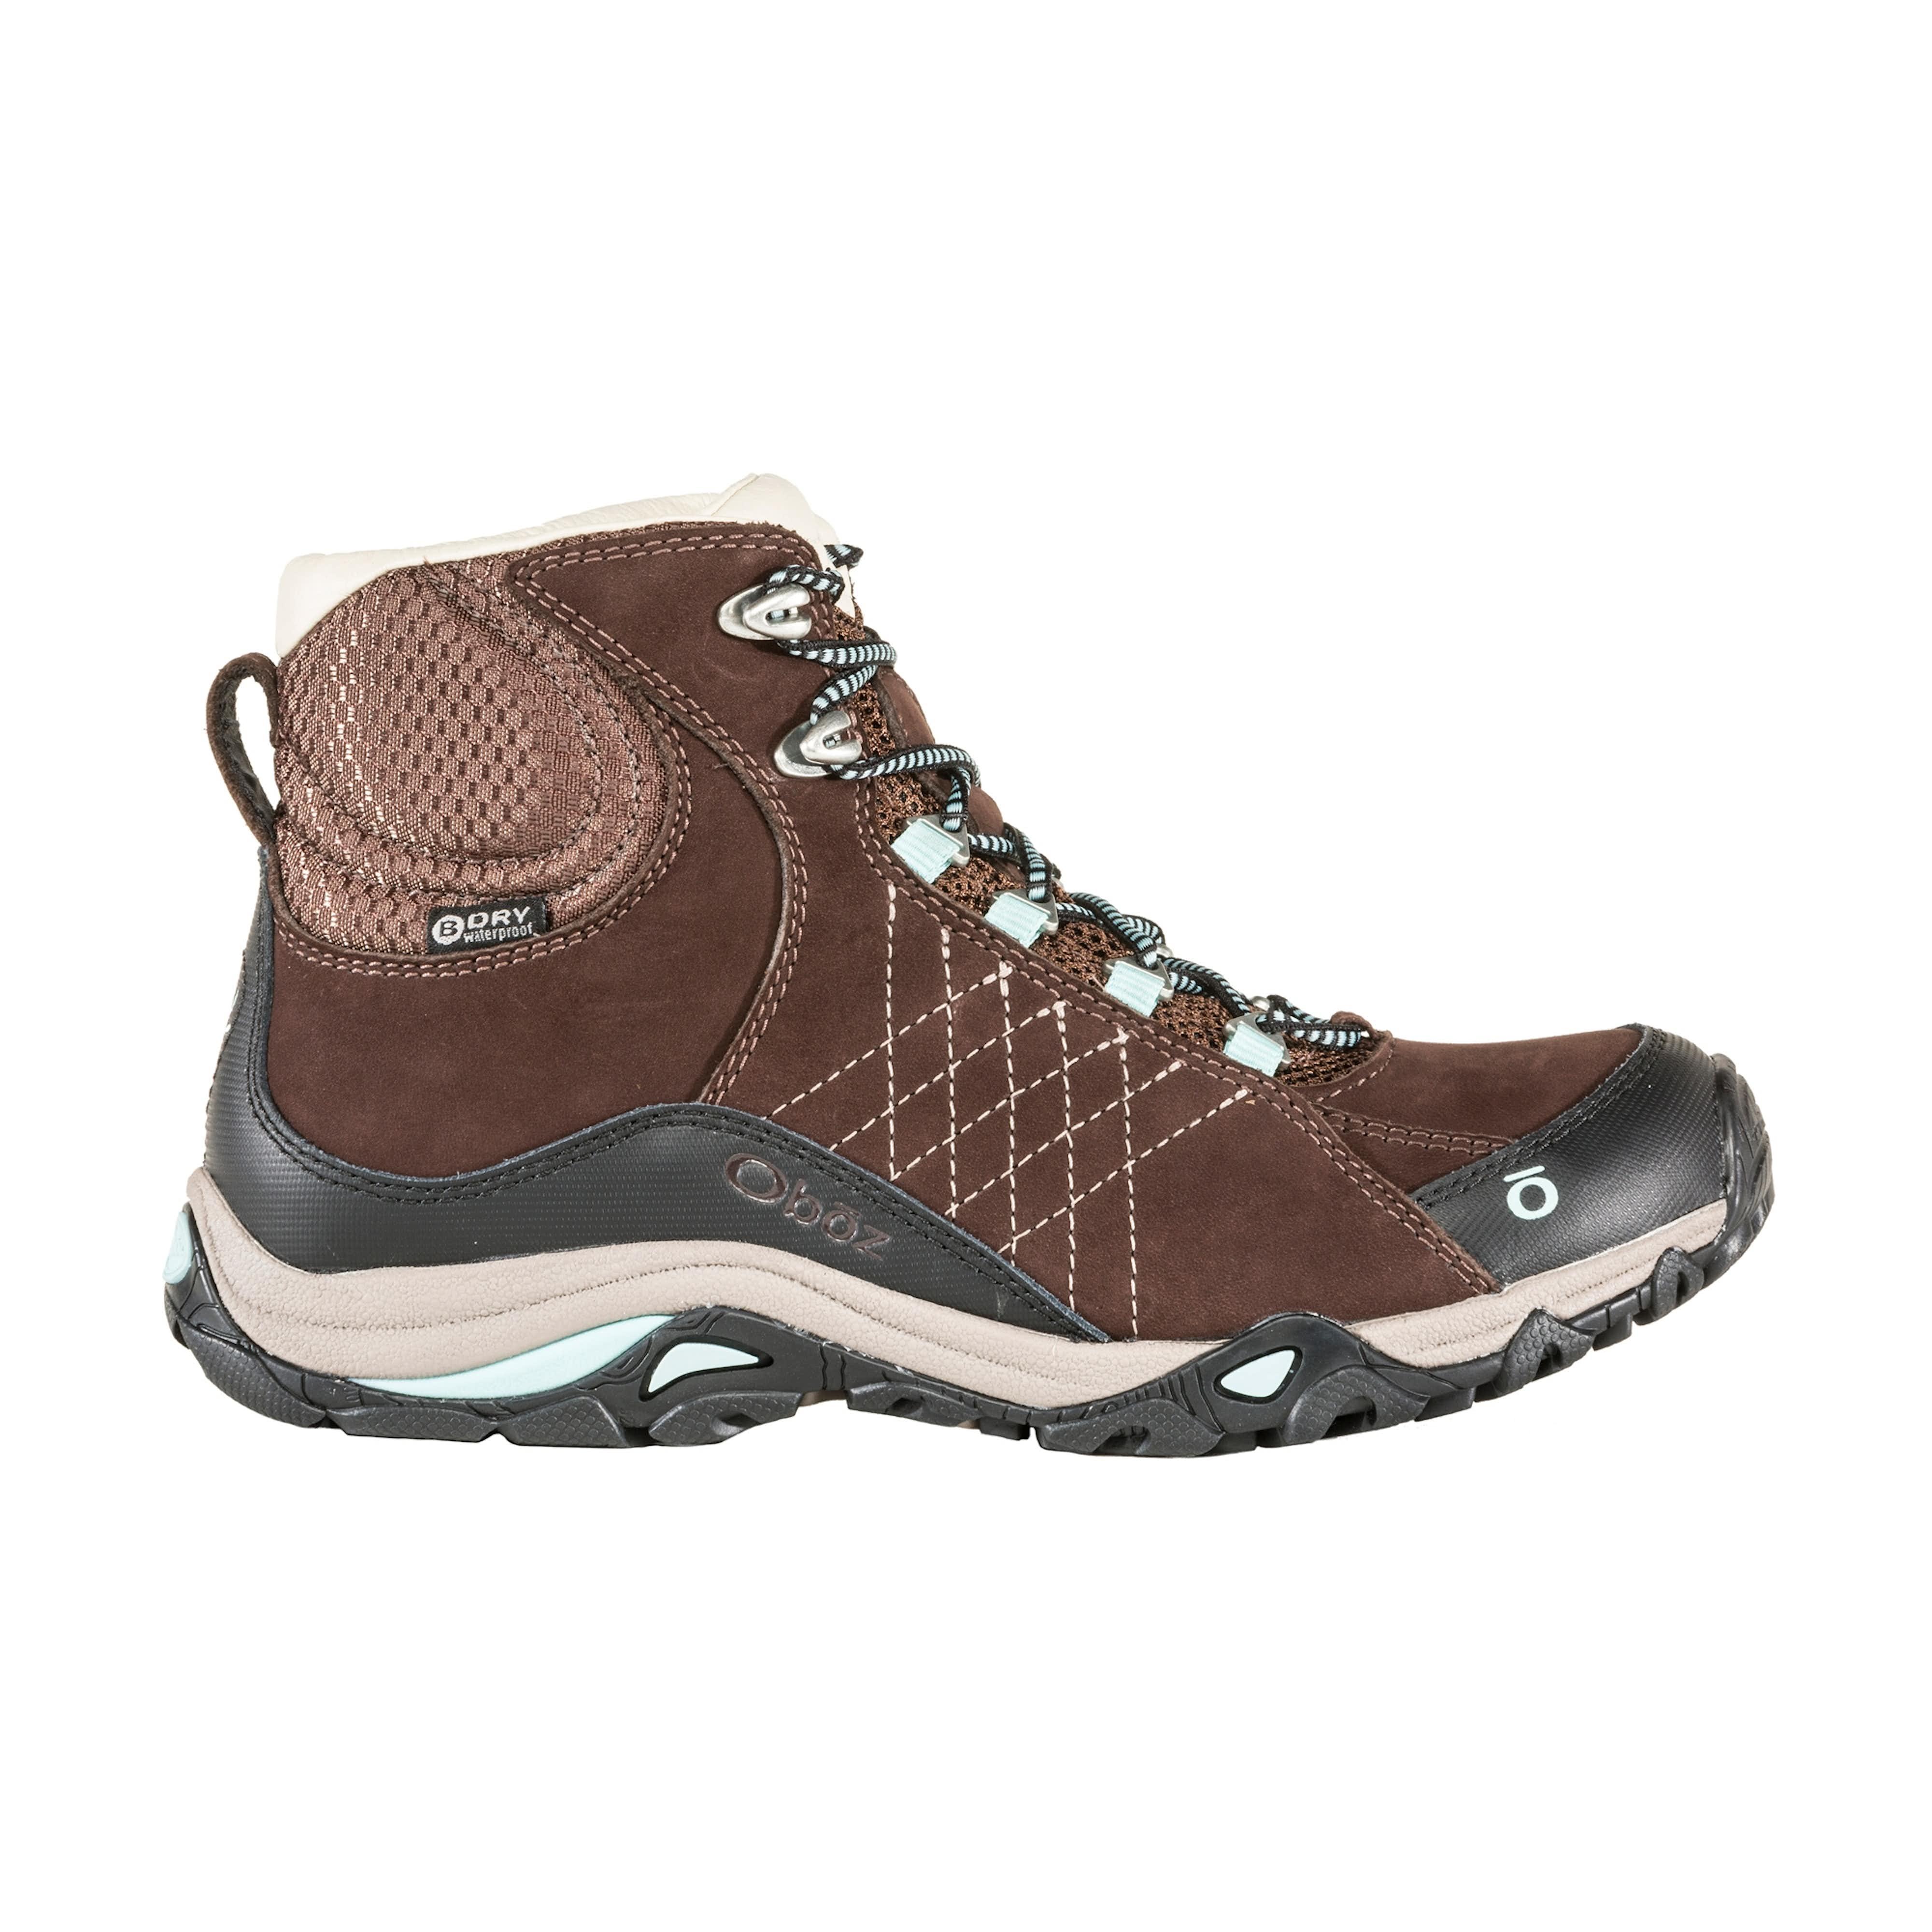 9f2f803a40b Oboz Shoes, Sandals, Boots for women & men | Kathmandu AU